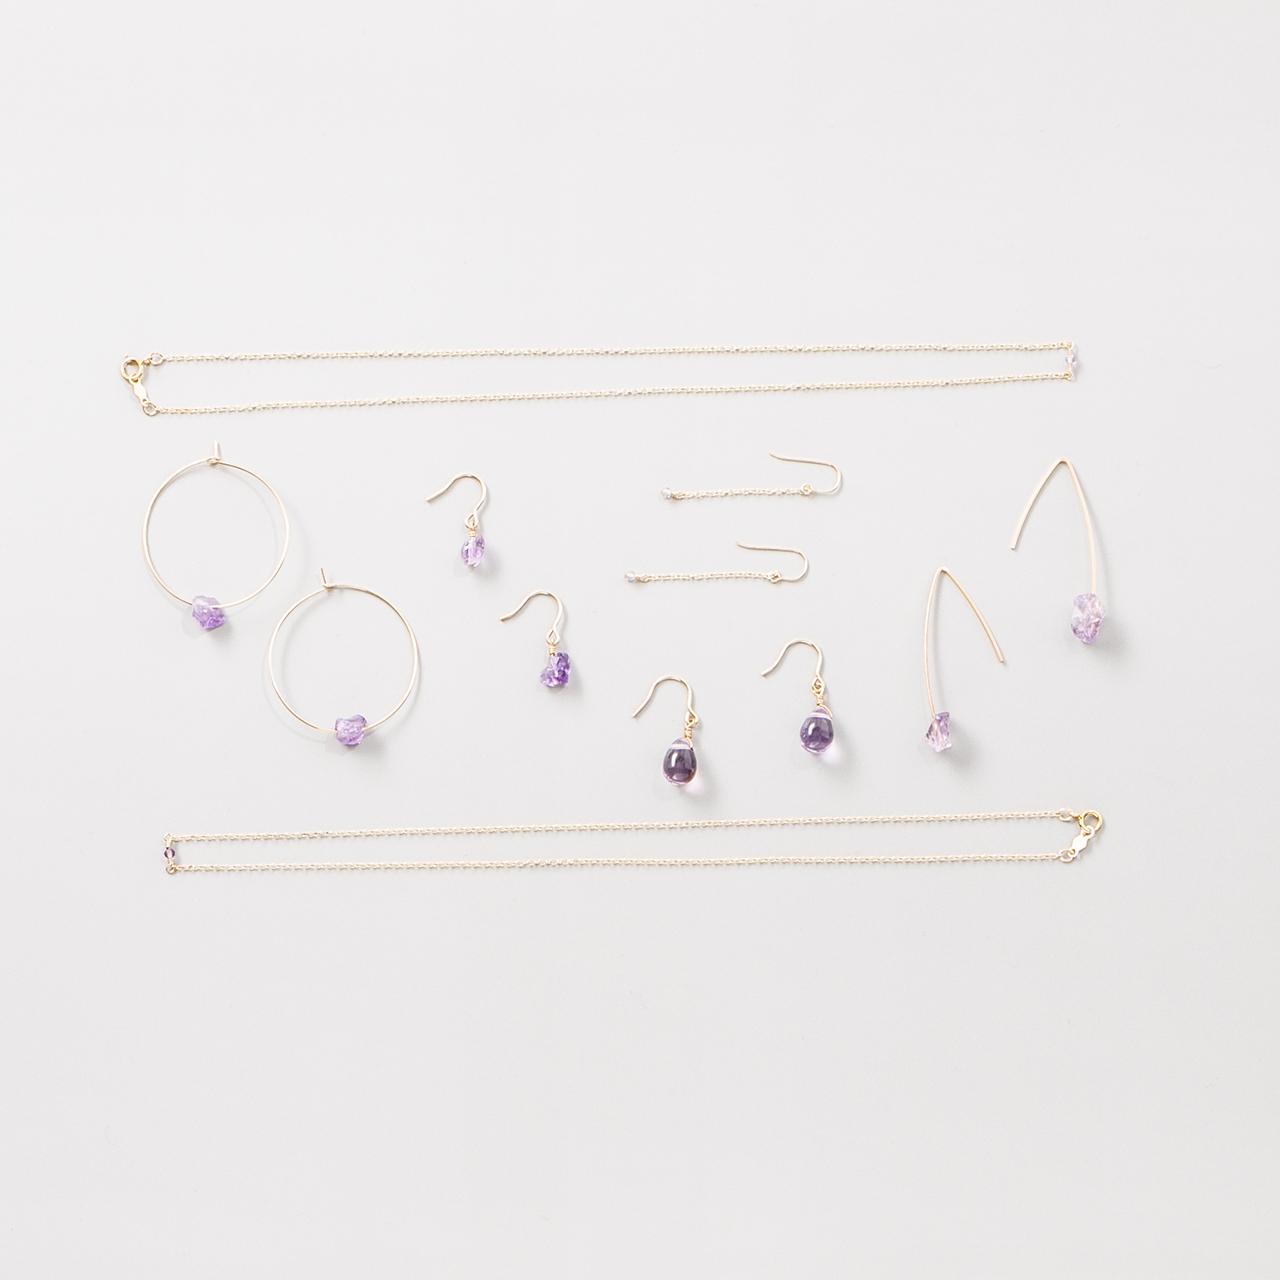 14kgf jewlry series【 amethyst 】